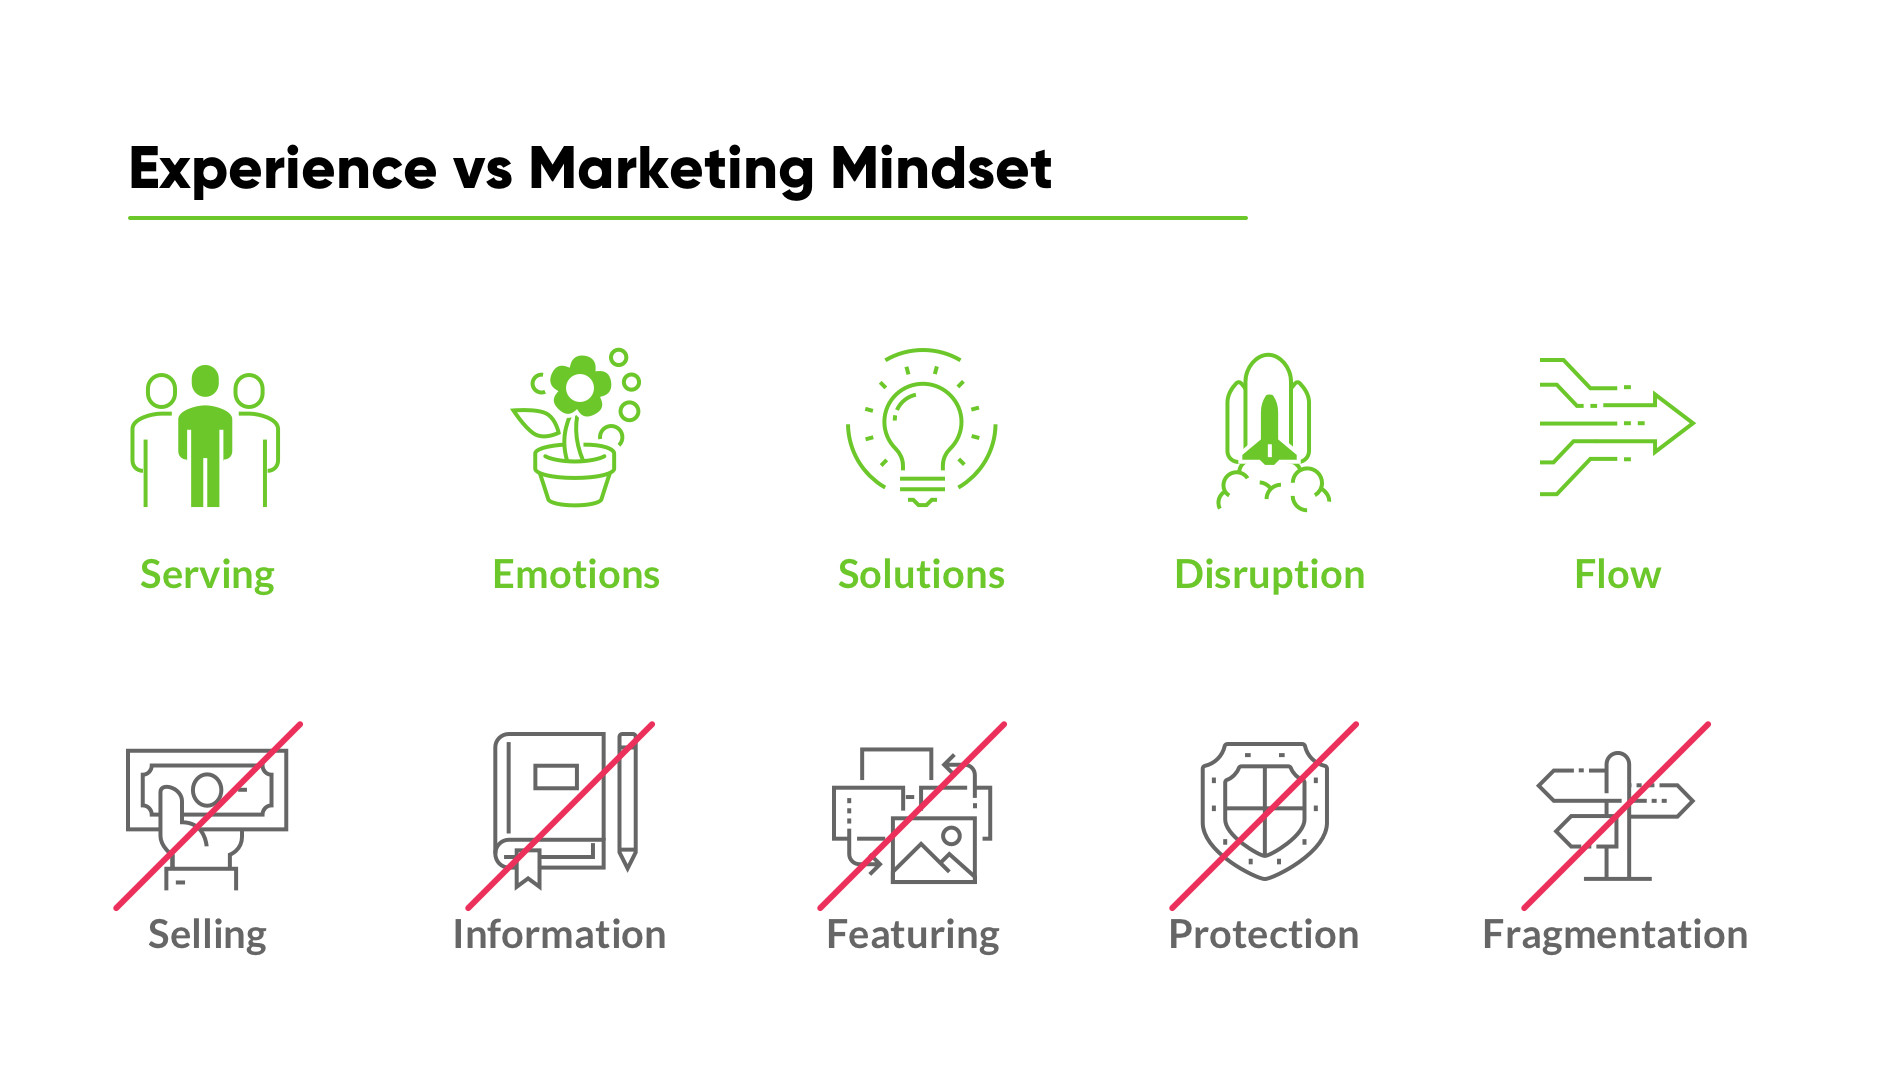 experience-mindset-ux-design-9.jpg